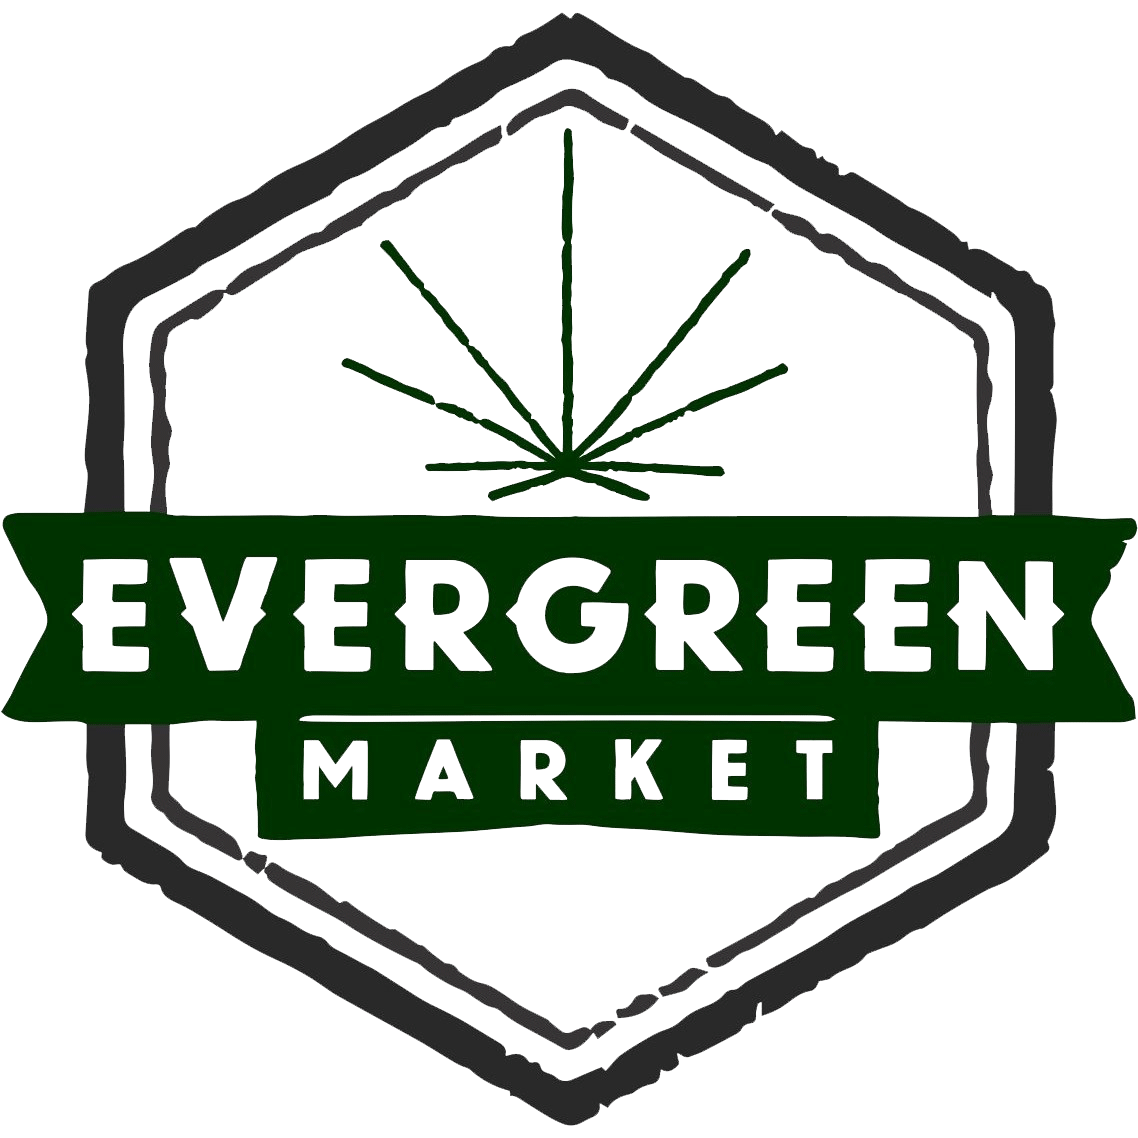 Evergreen Market - Renton IKEA District